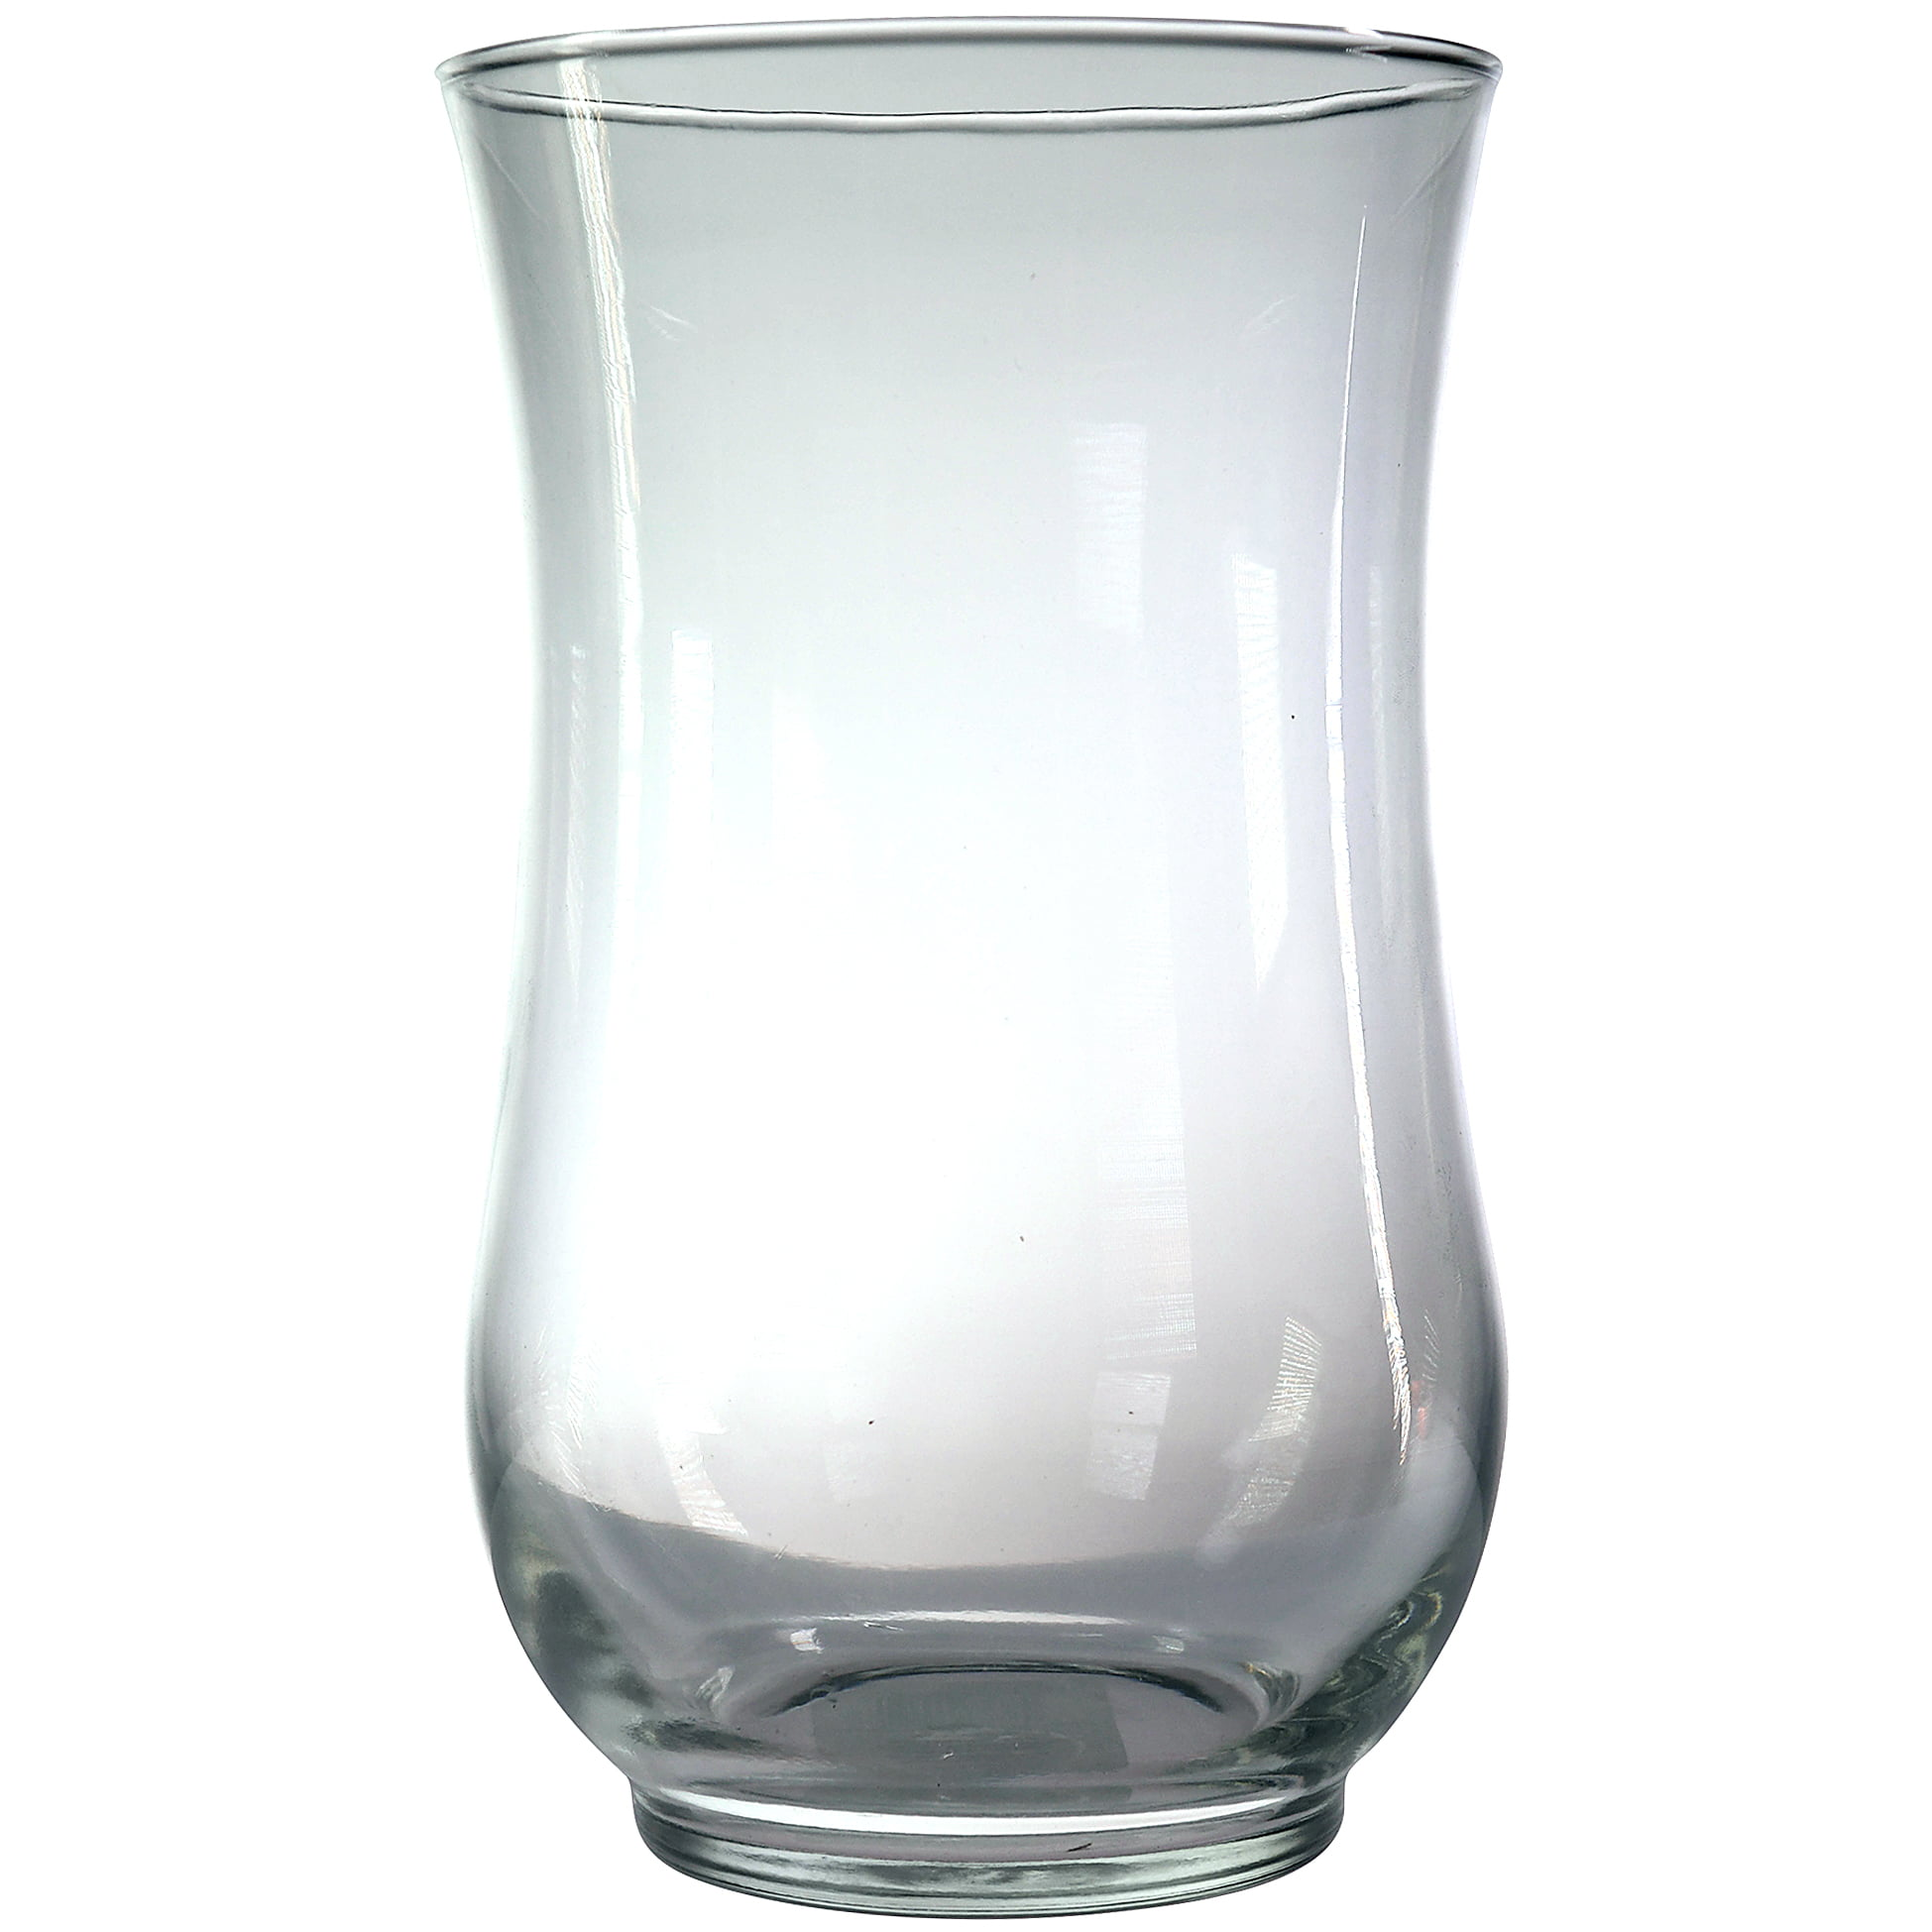 Mainstays Curved Glass Hurricane Candle Holder Walmart Com Walmart Com